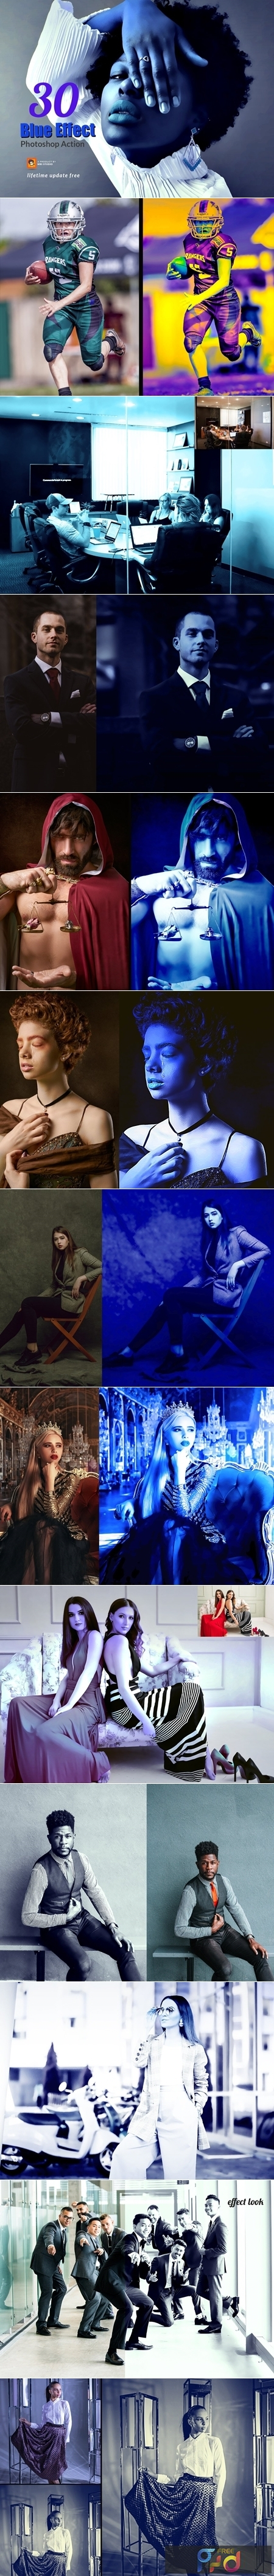 30 Blue Effect Photoshop Action 3747230 1